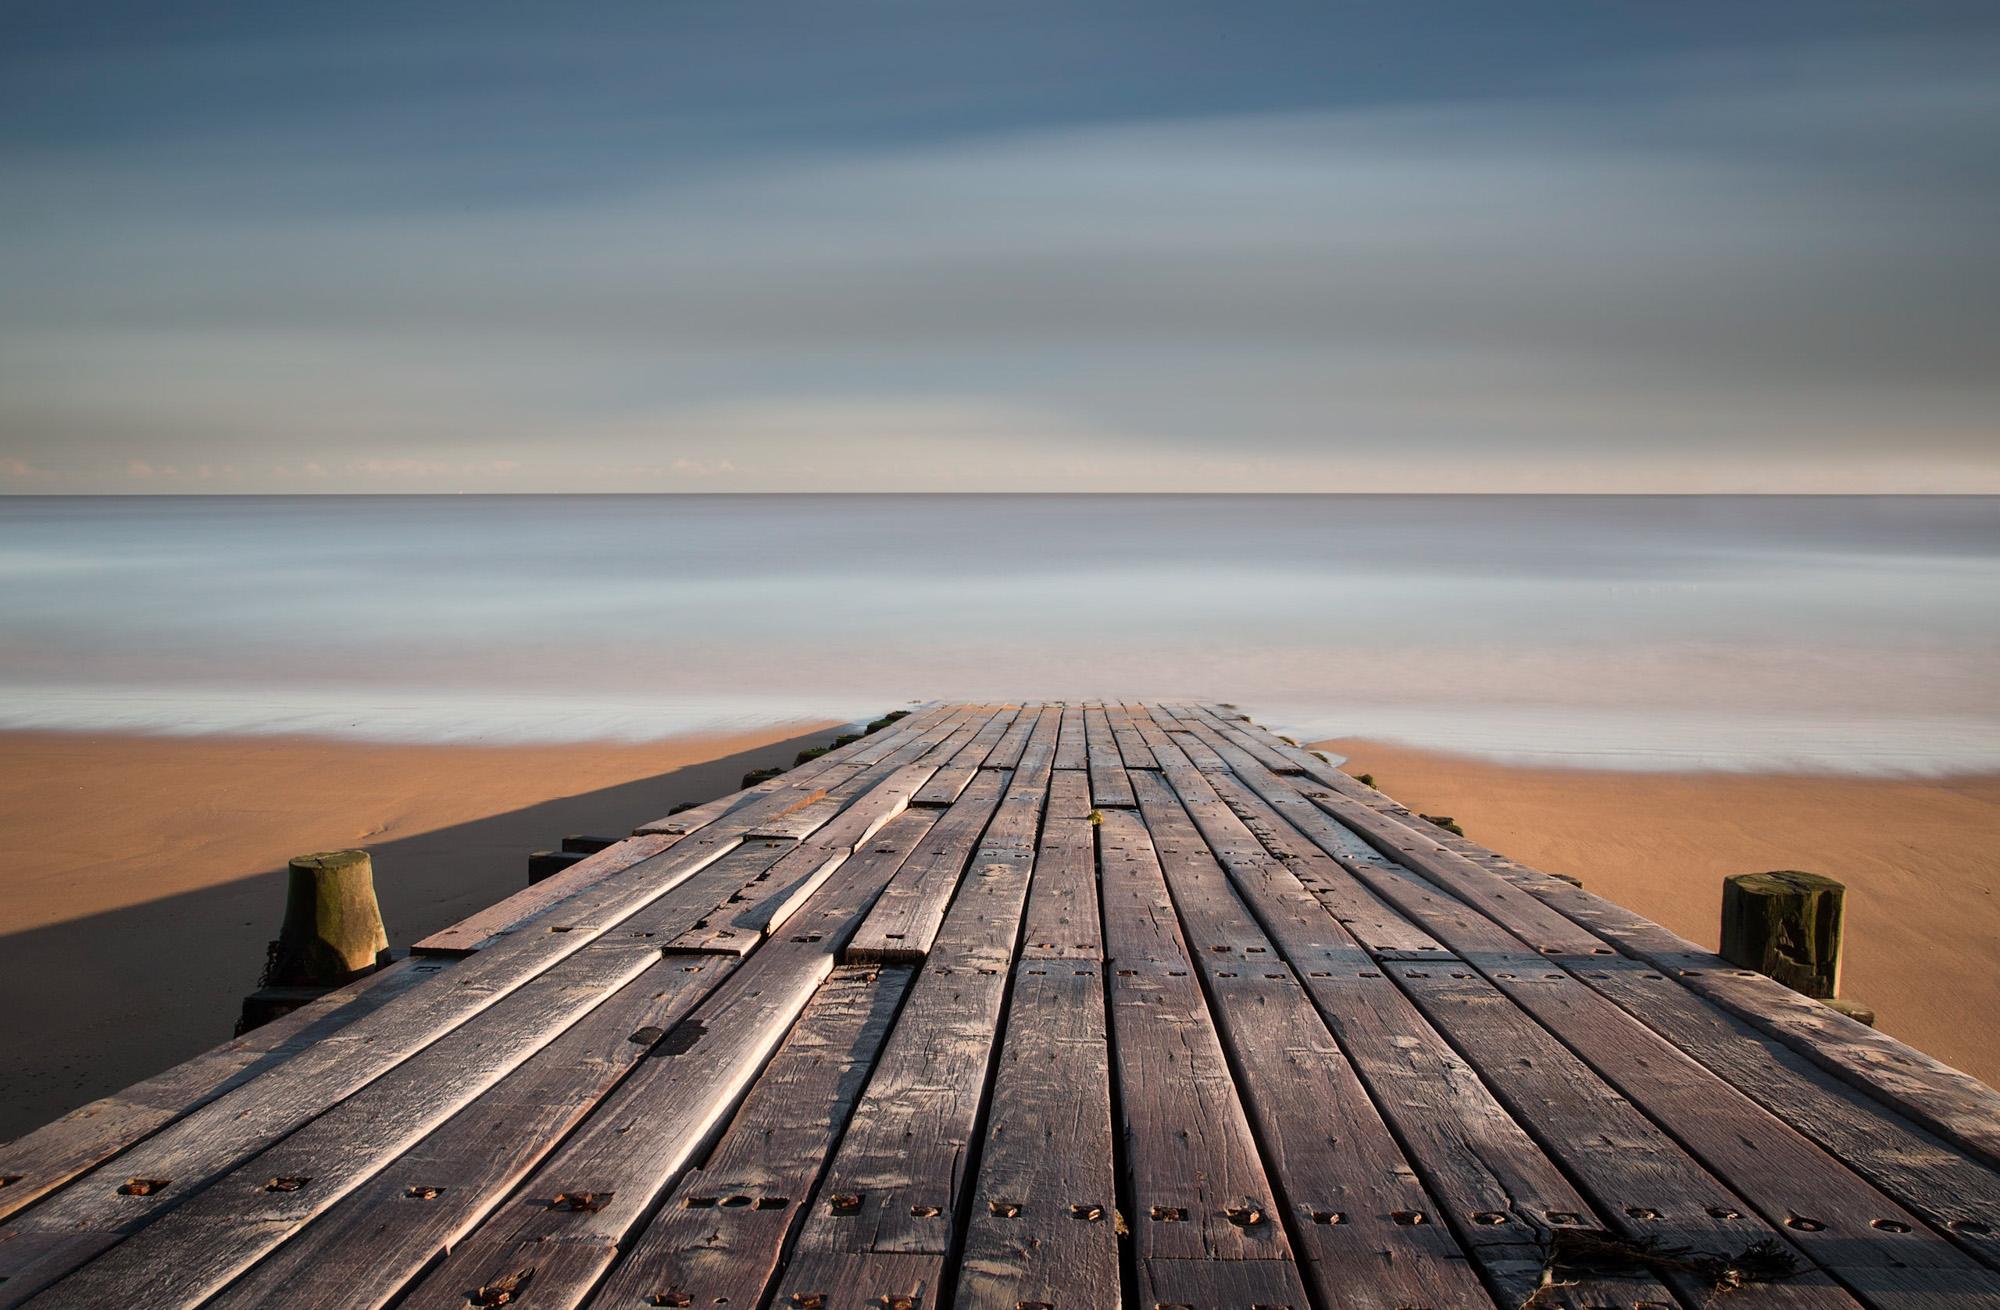 antonyz long exposure landscape photograph of a wooden boardwalk facing the sea